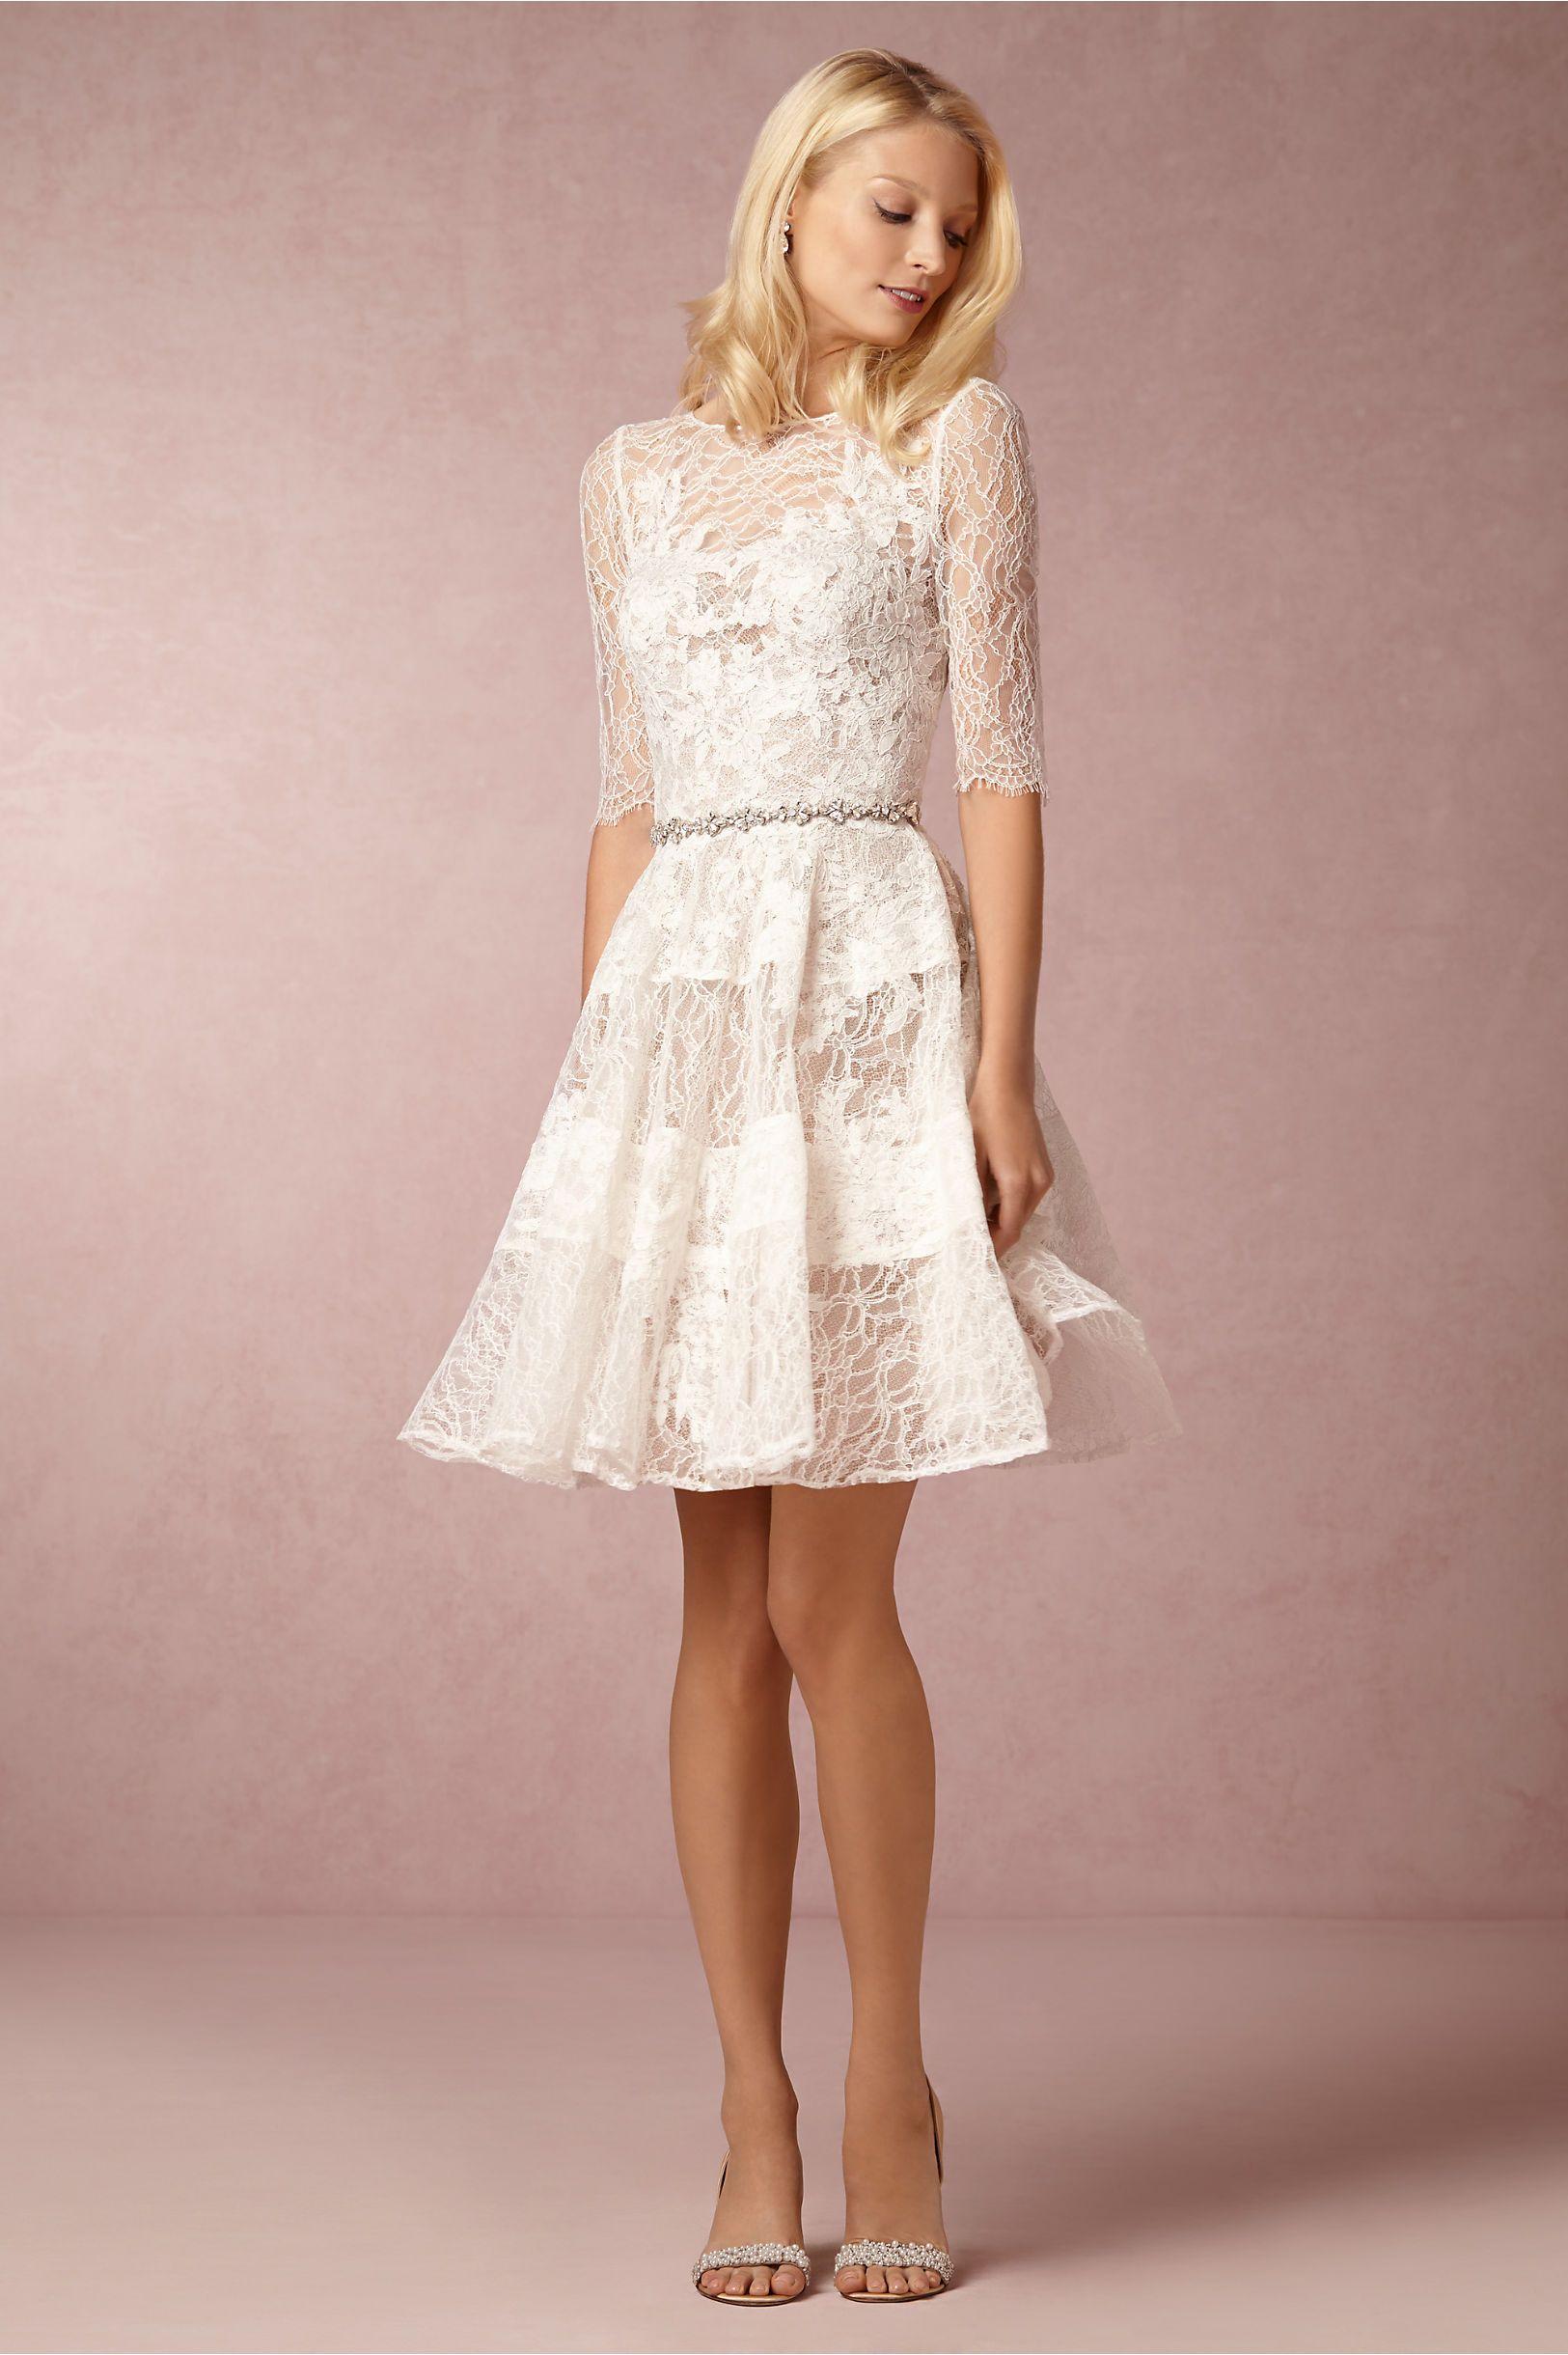 The Gorgeous BHLDN Wedding Dresses | Wedding dress, Summer ...